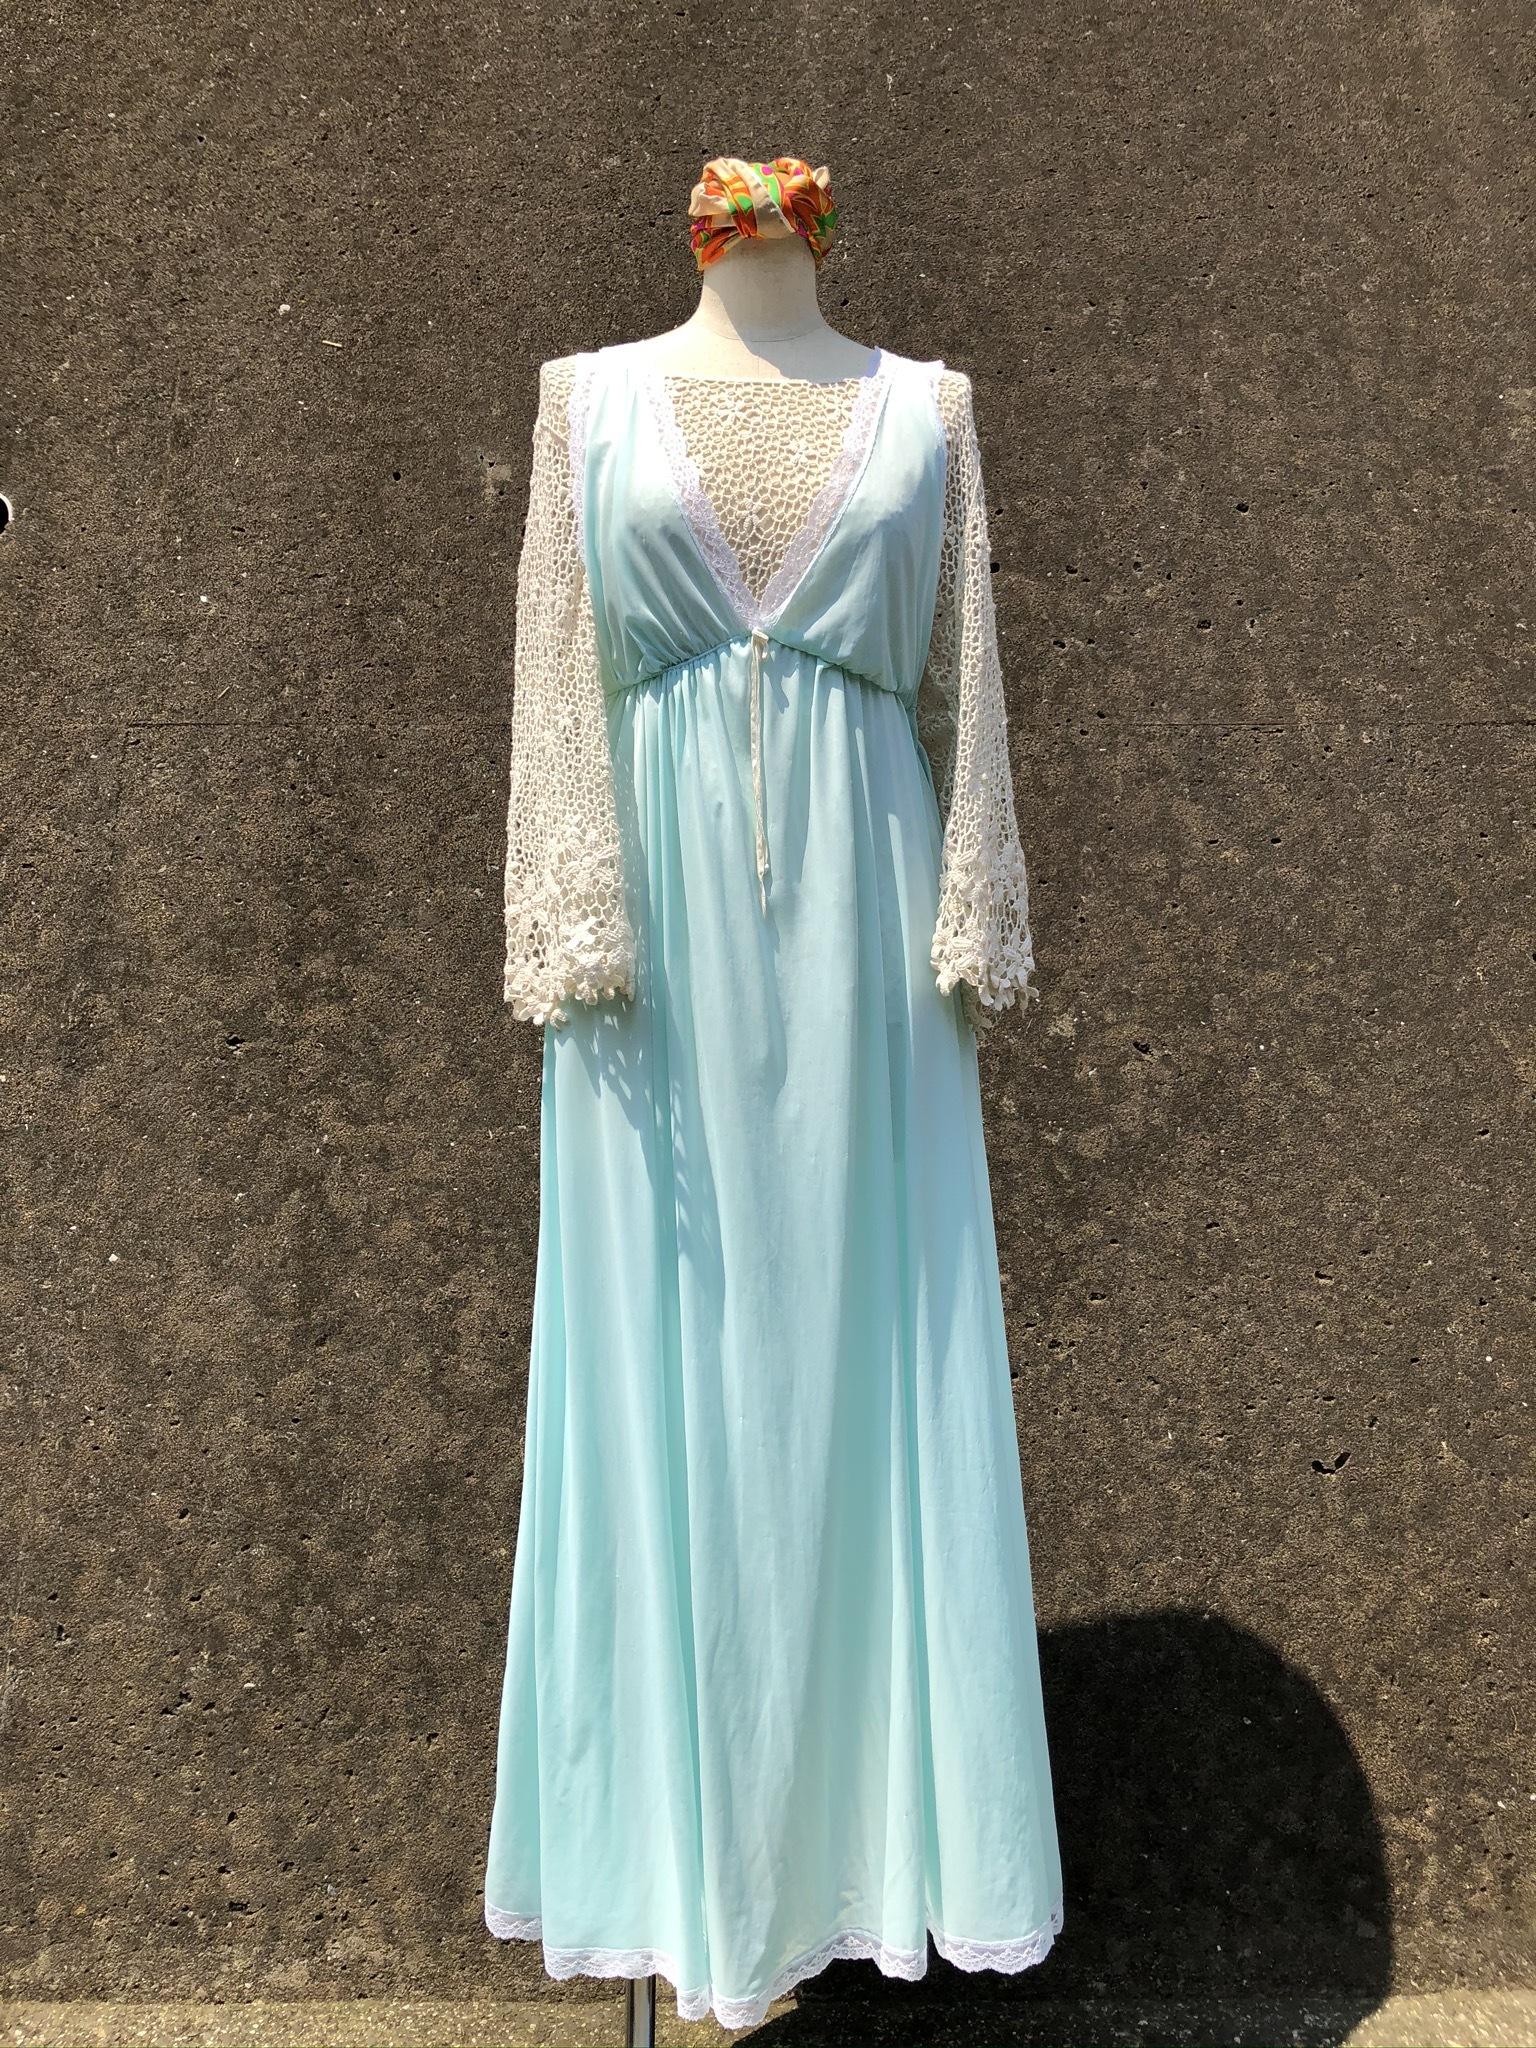 skyblue night dress